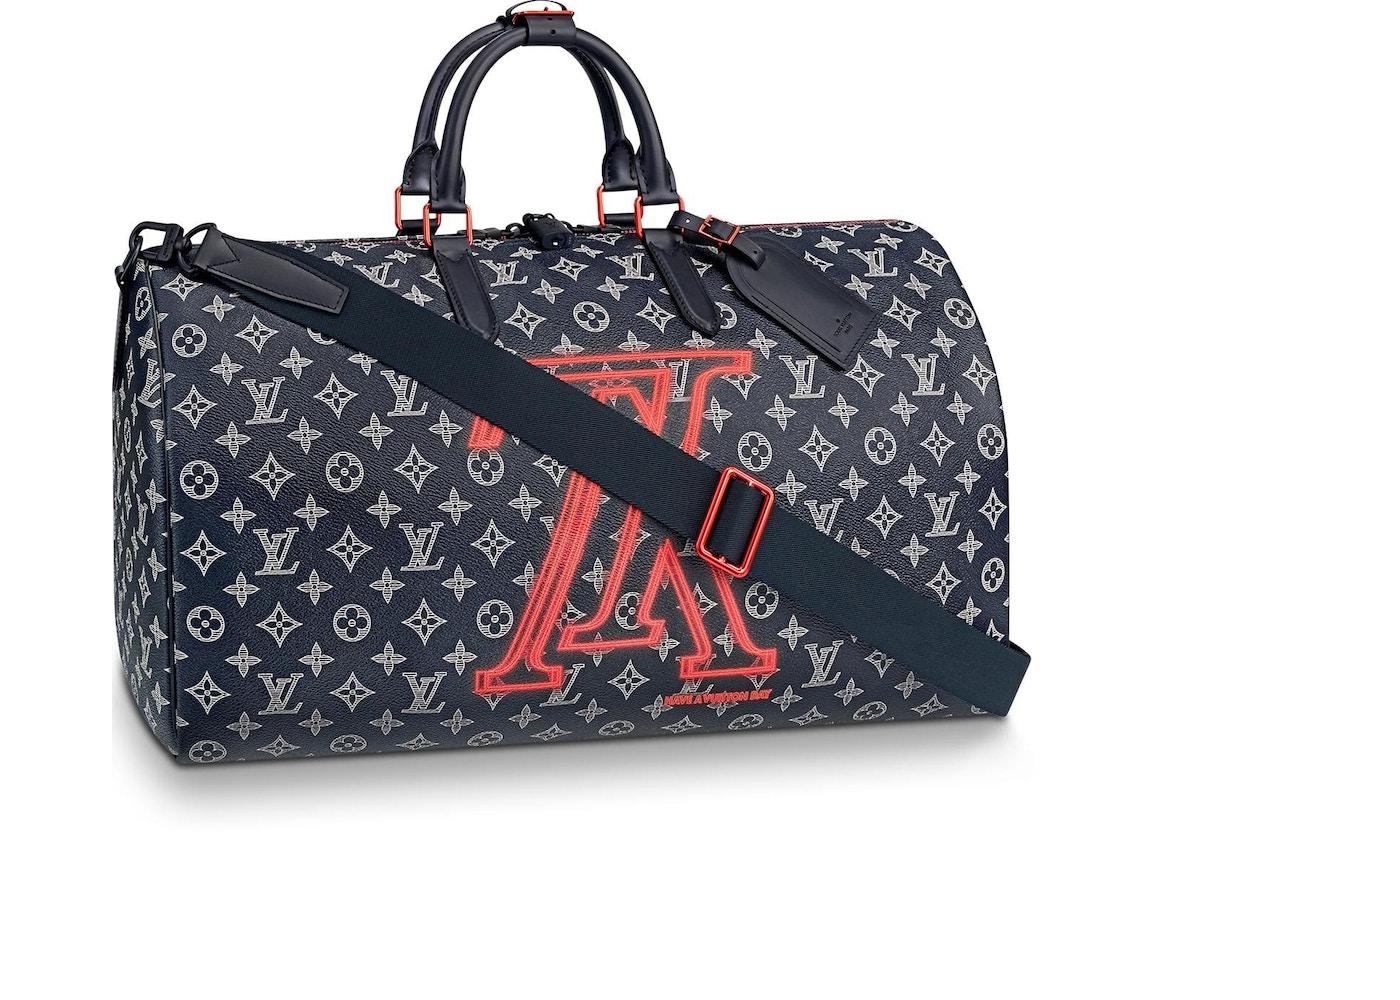 Louis Vuitton 50 Keepall Bandouliere Monogram Upside Down Ink Navy. Monogram  Upside Down Ink Navy ca24e1a4d8da8